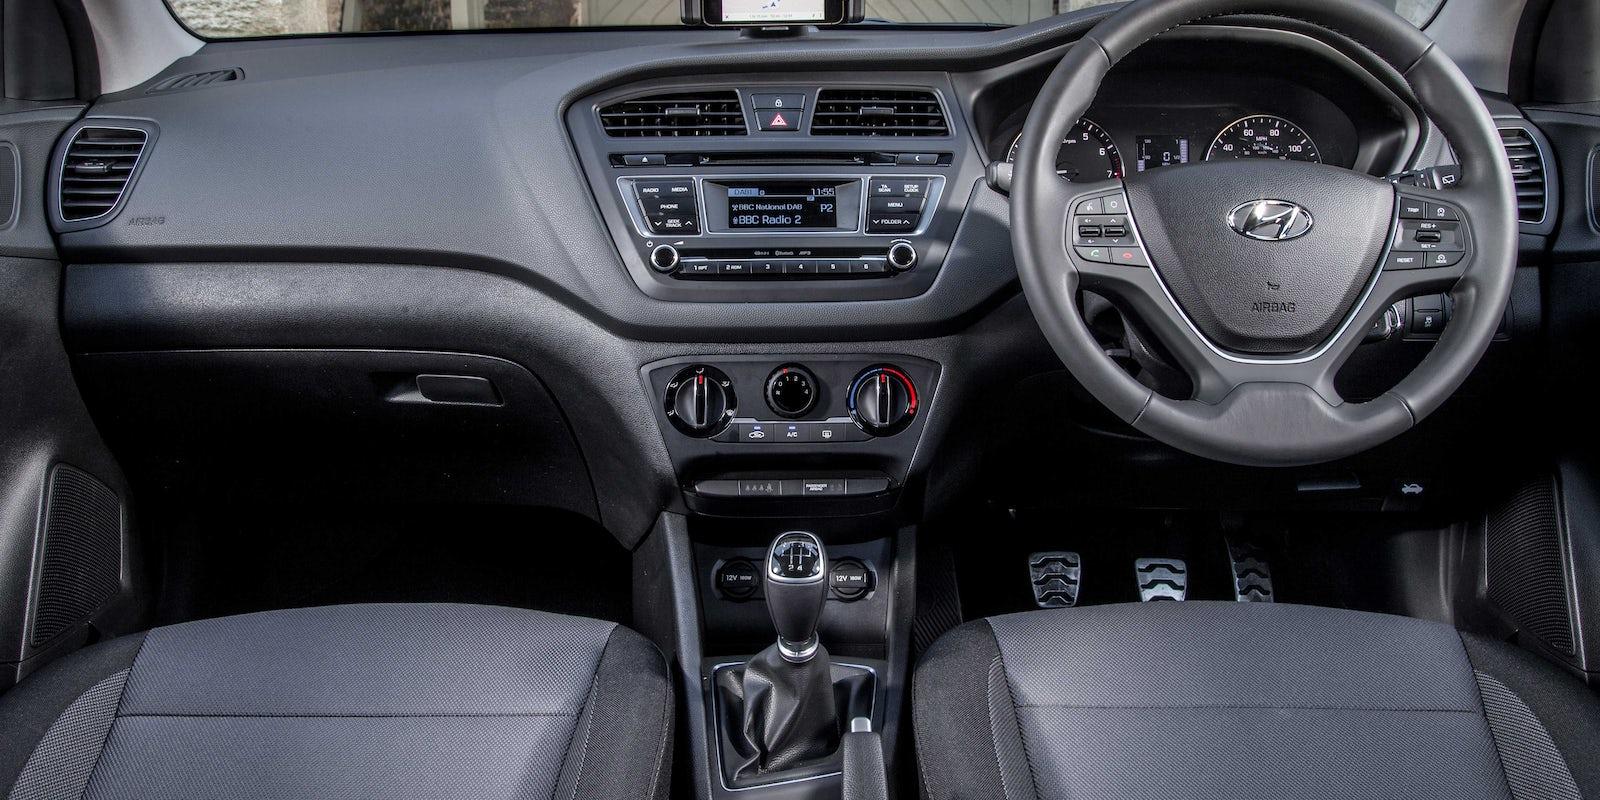 Hyundai i20 active interior infotainment carwow - Hyundai i20 interior ...